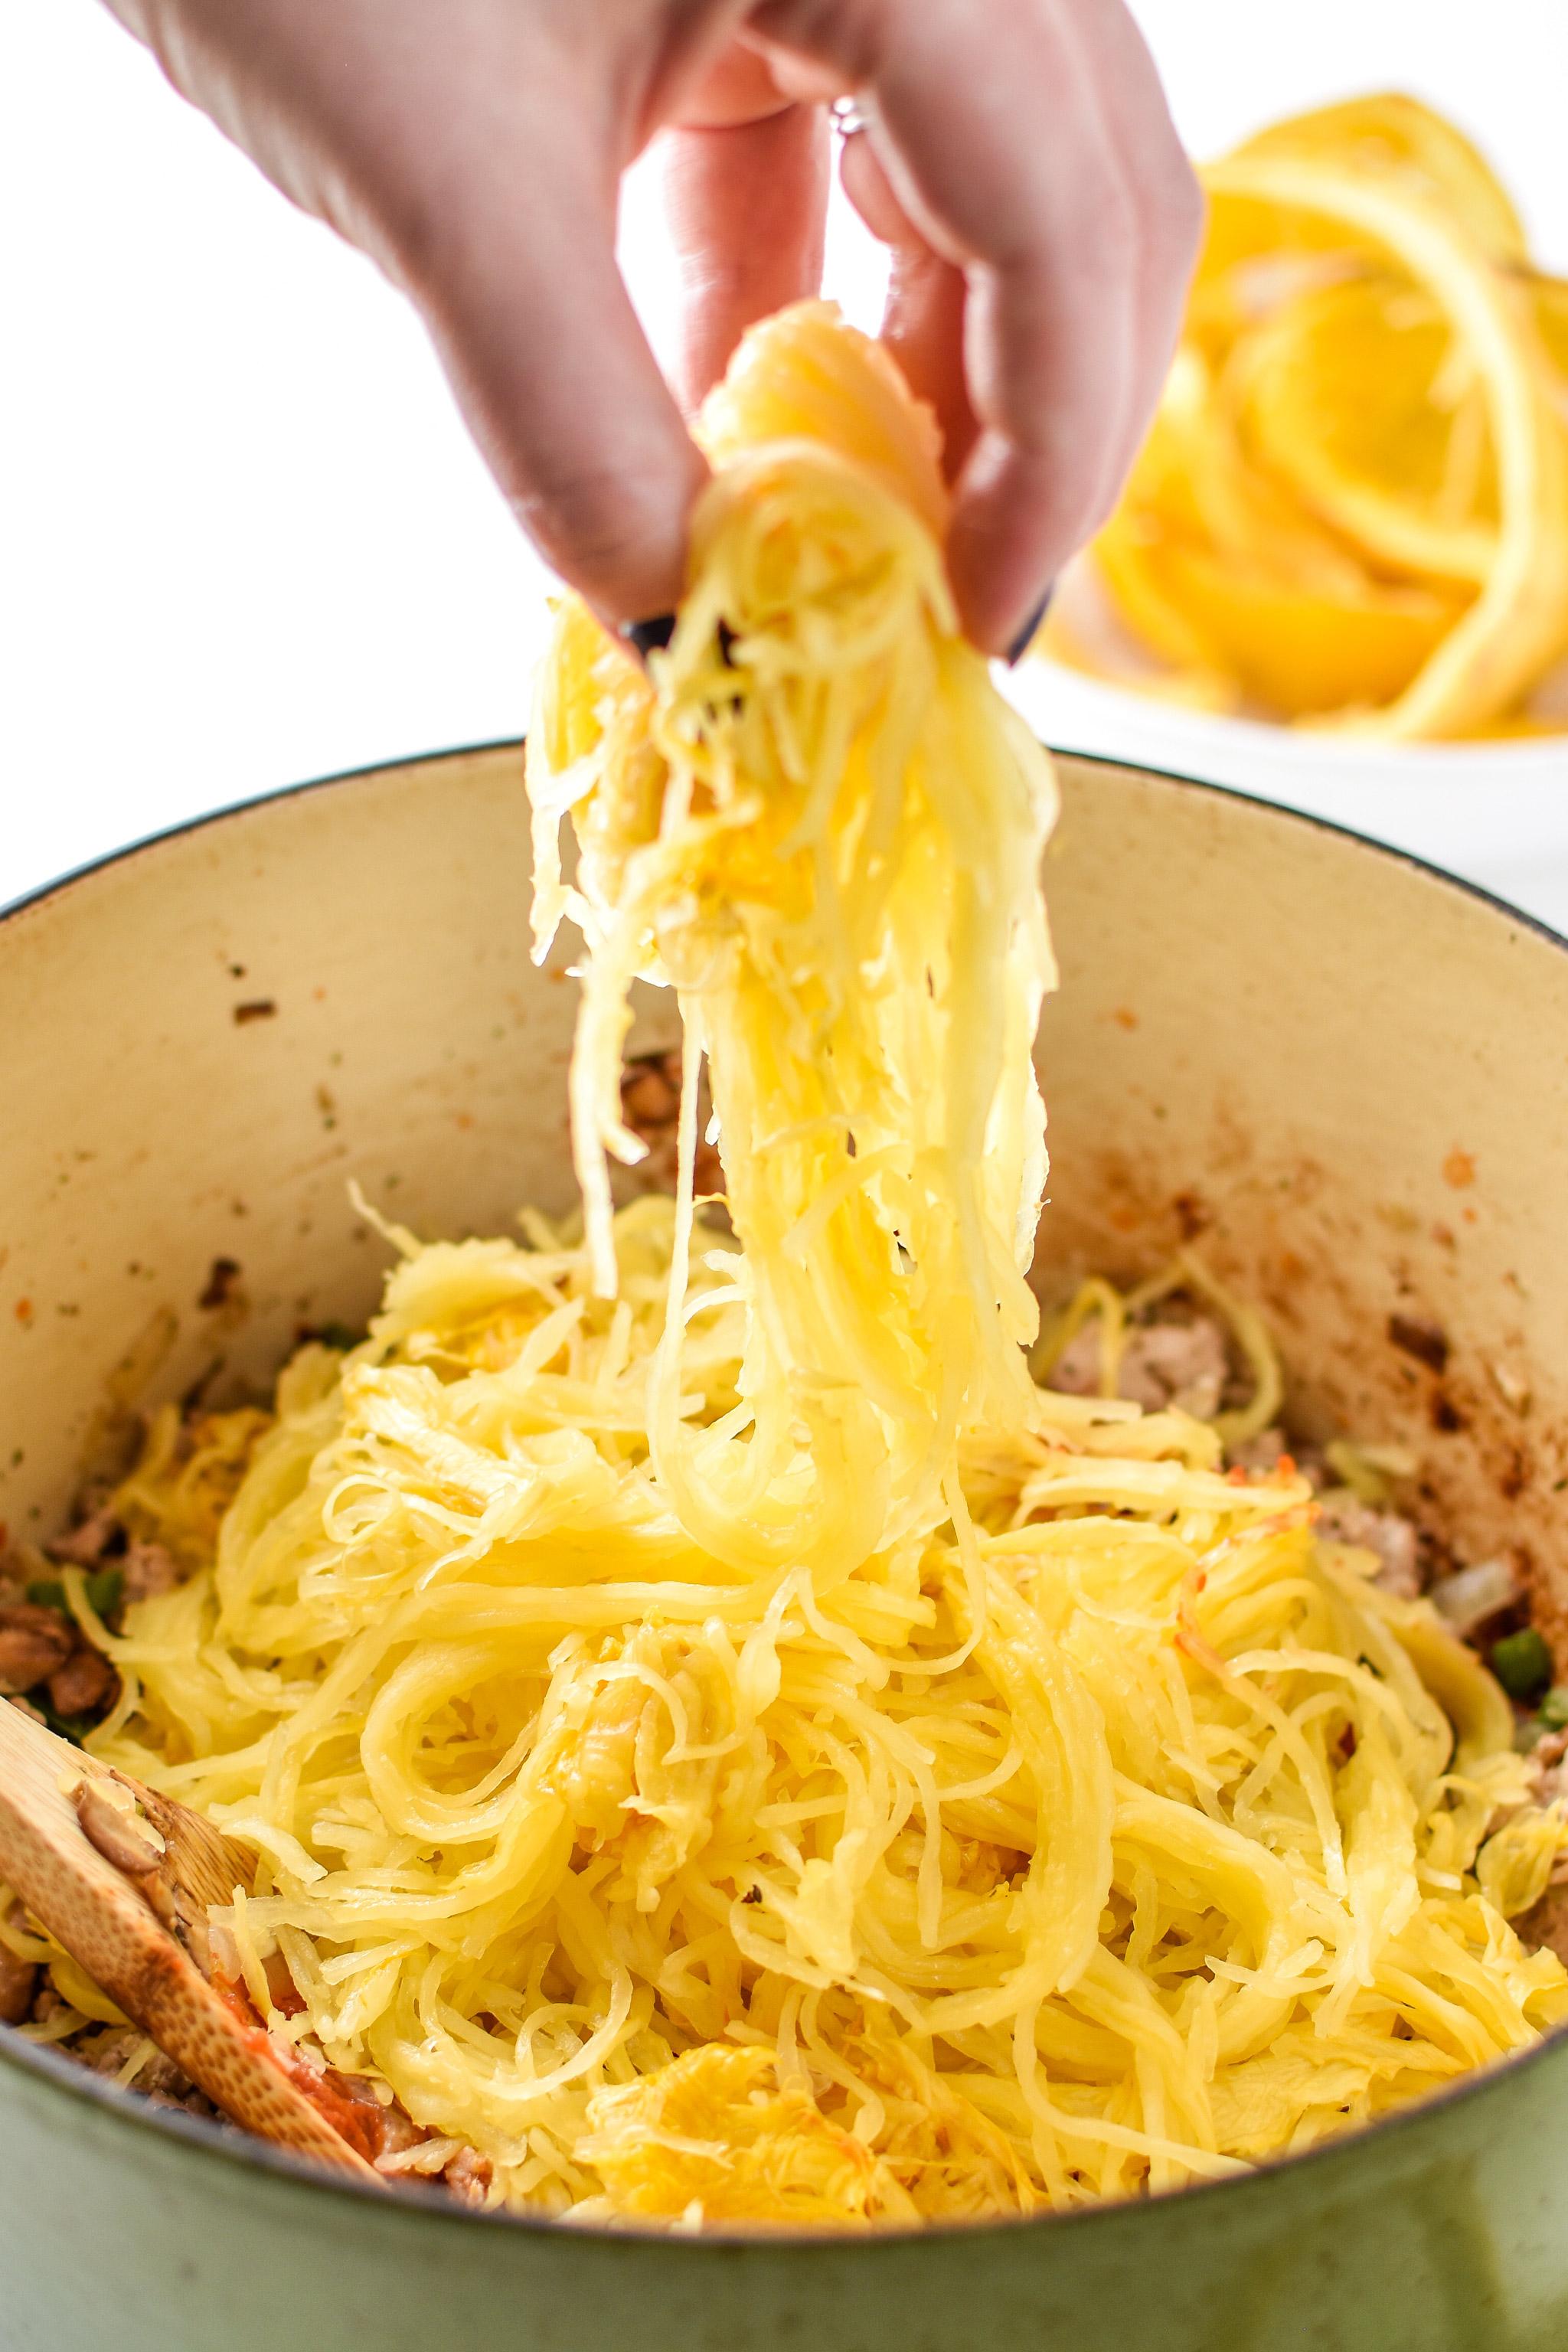 Noodles in the spaghetti squash spaghetti bake